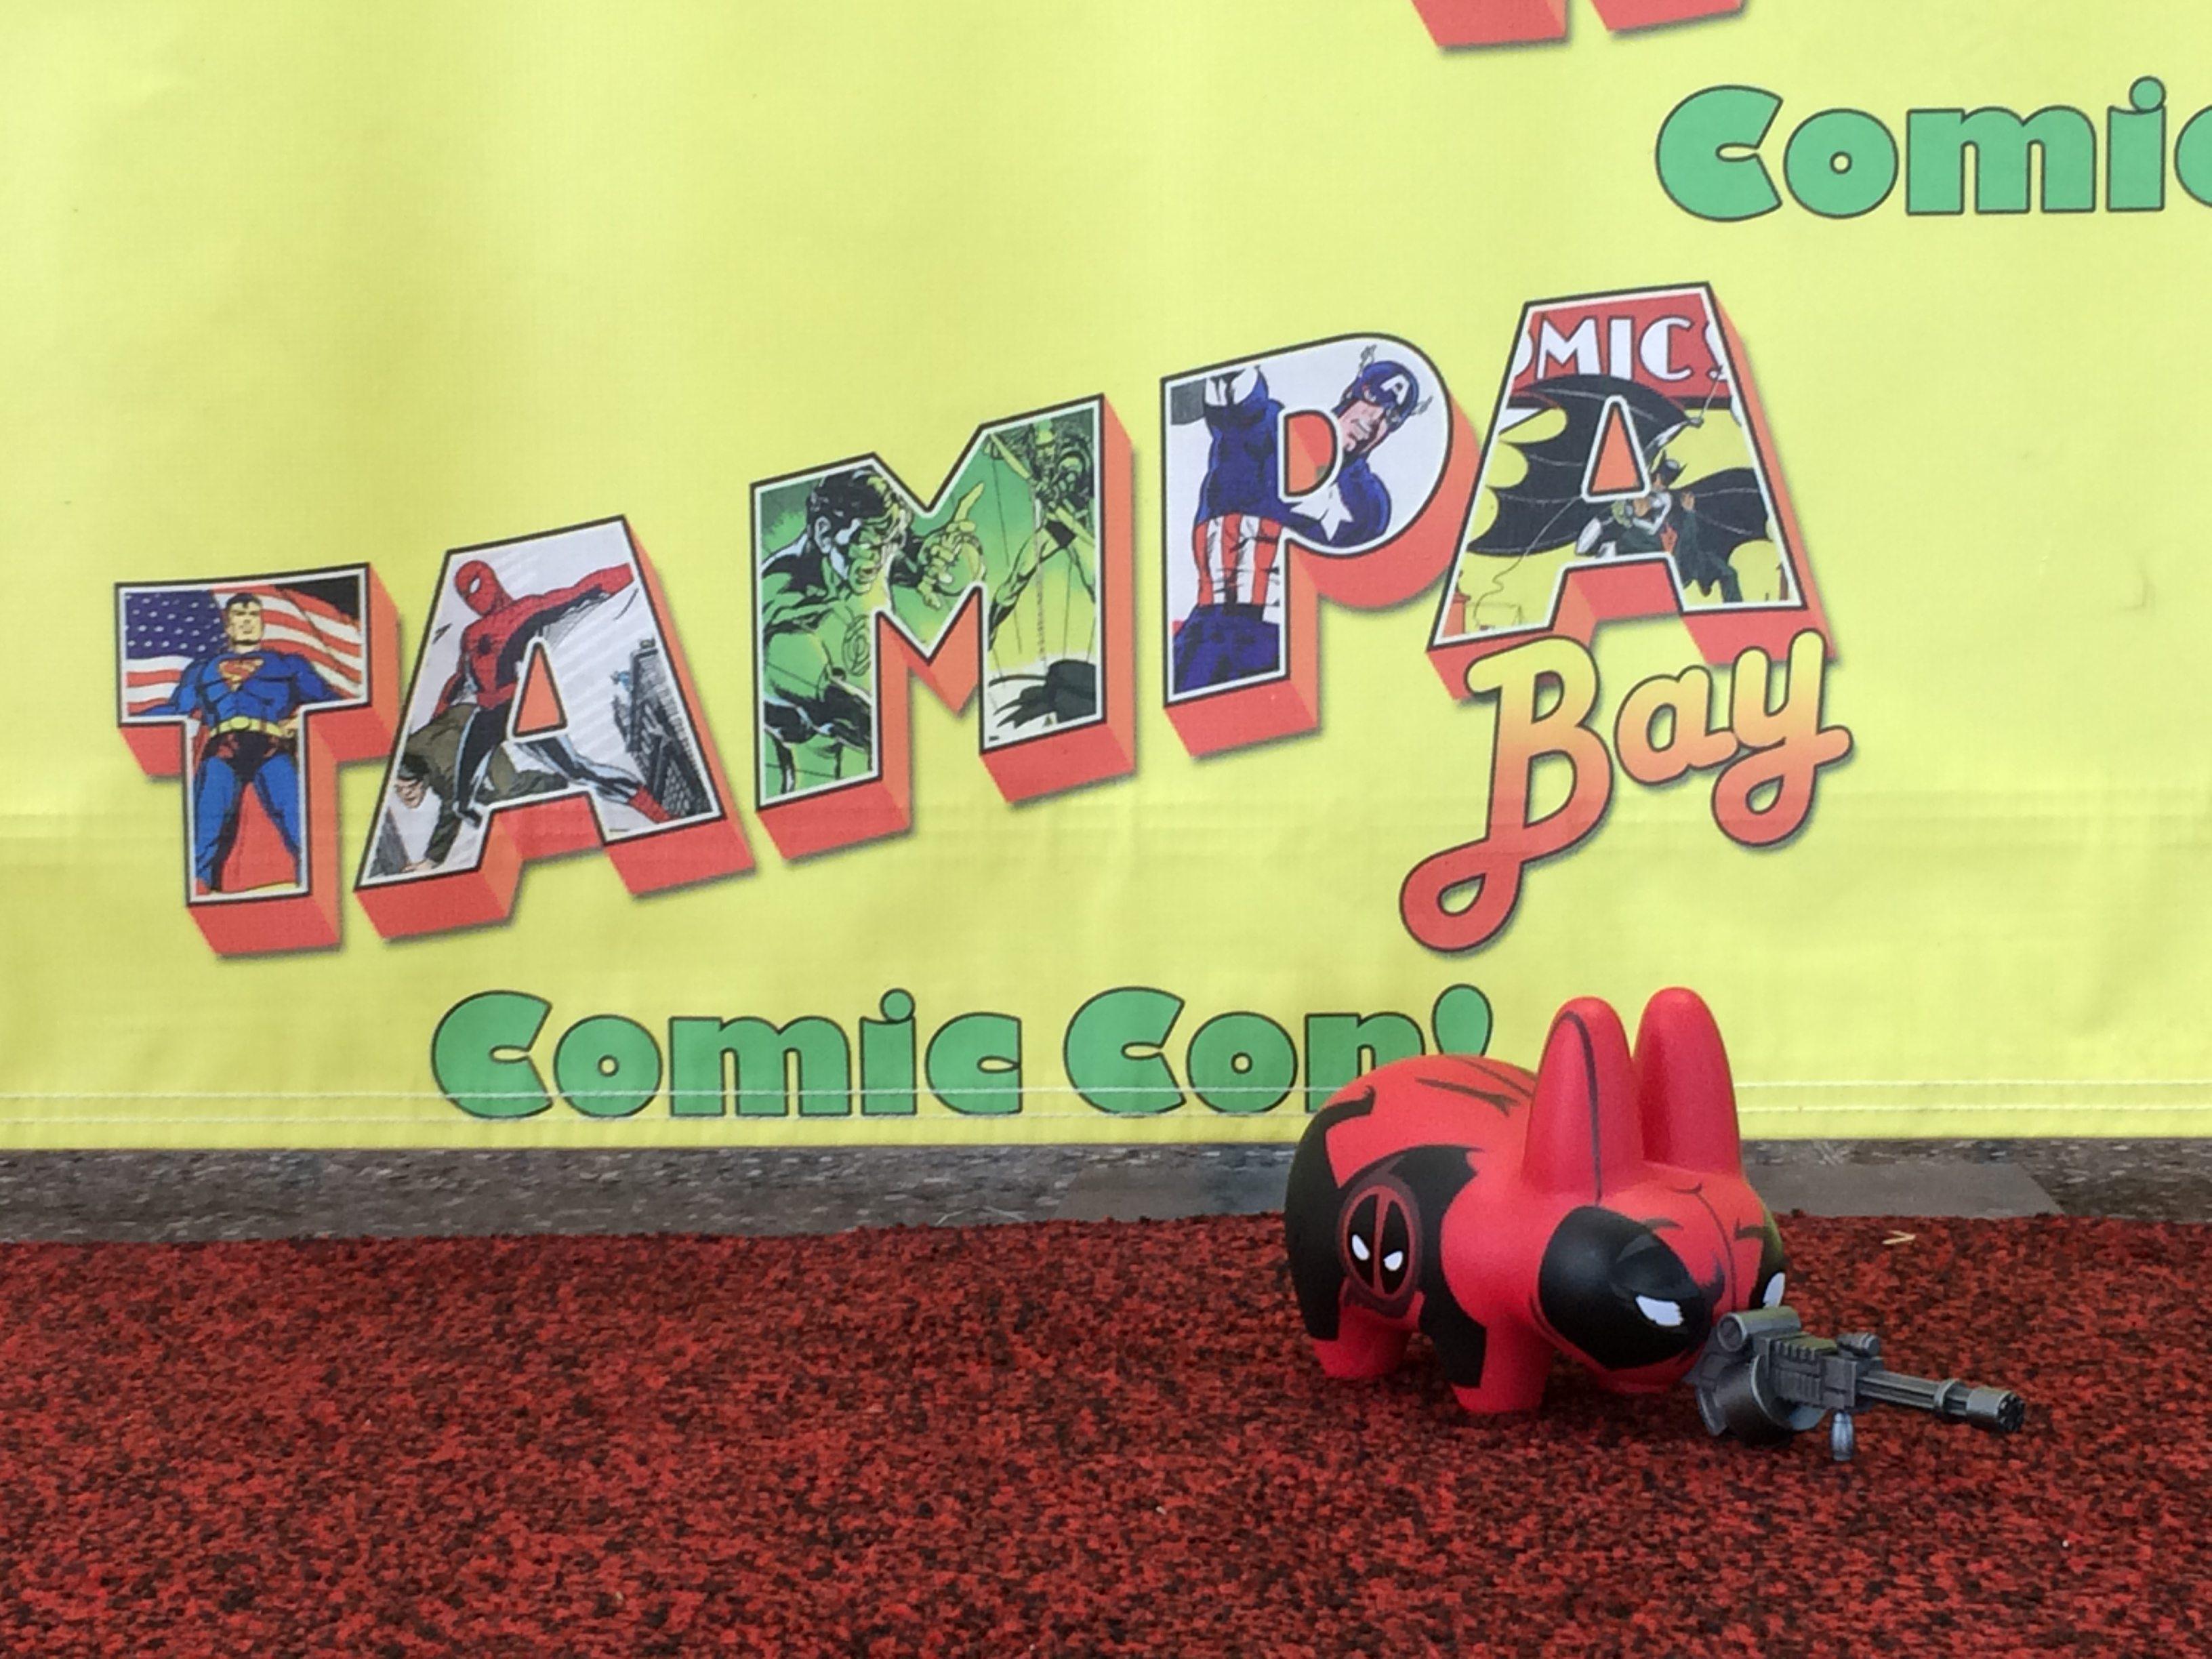 Deadpool Labbit on the red carpet.  Image: Dakster Sullivan